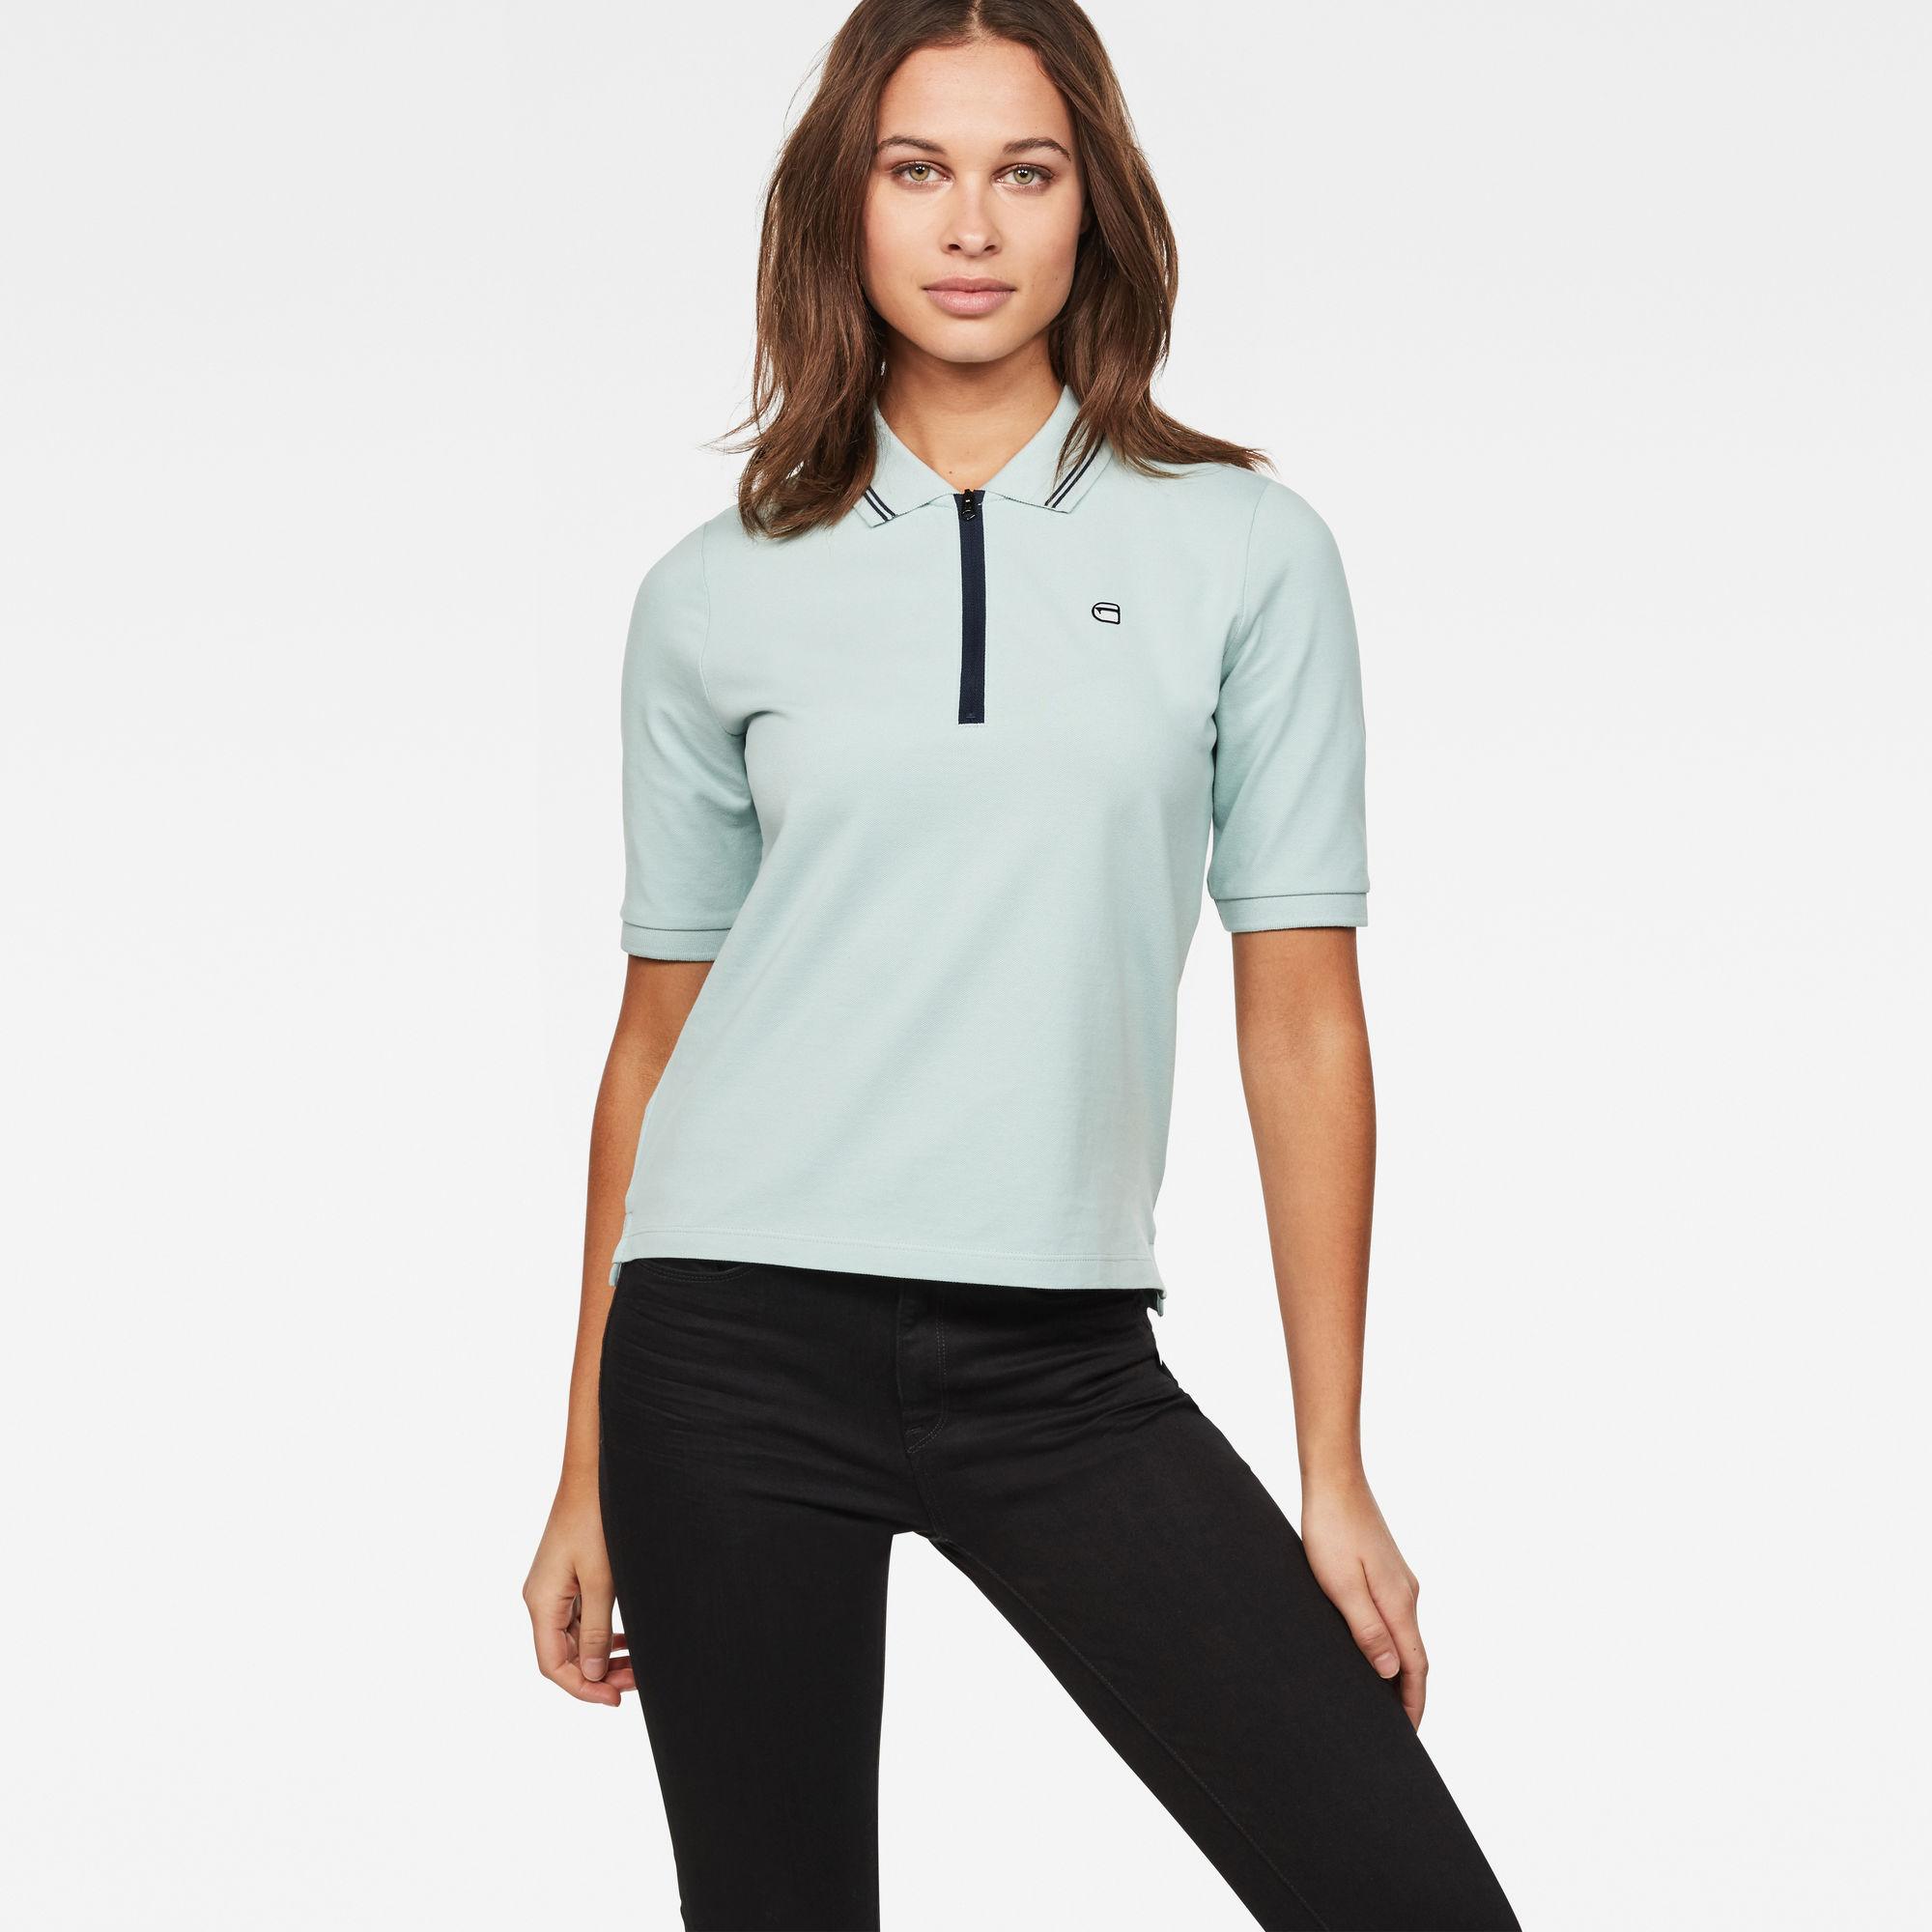 Raw Correct Slim 1 2-Sleeve Polo